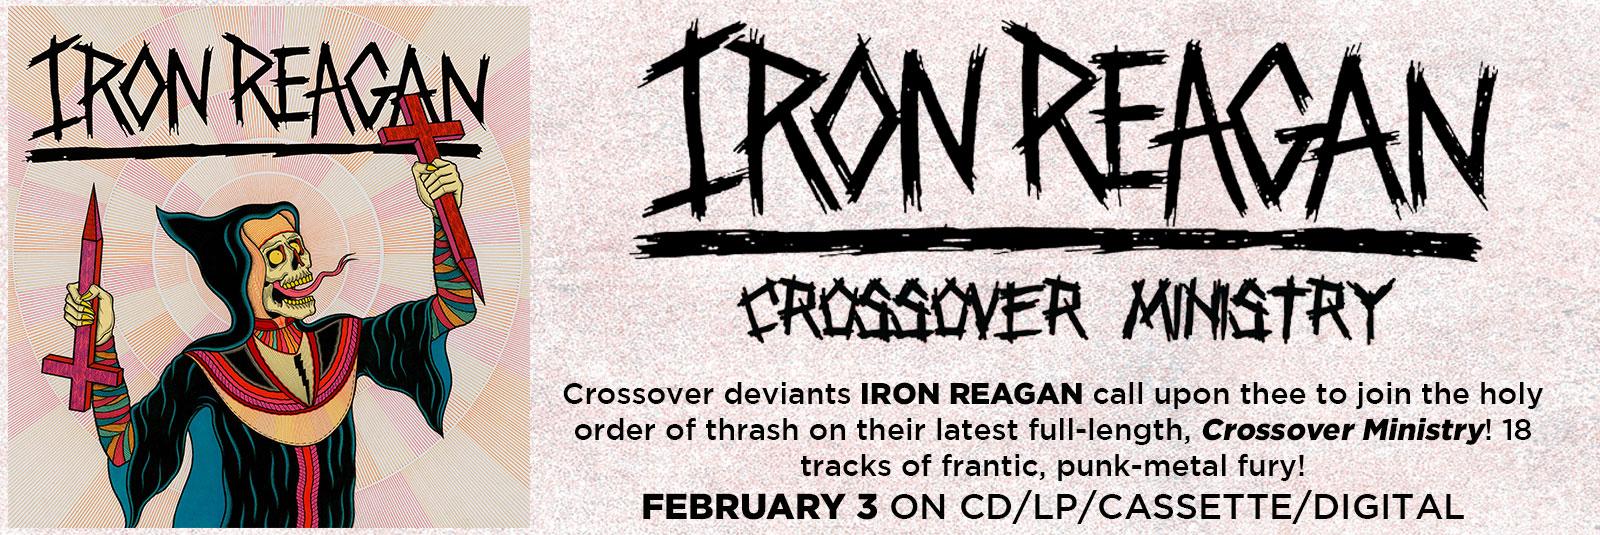 iron-reagan-crossover-ministry